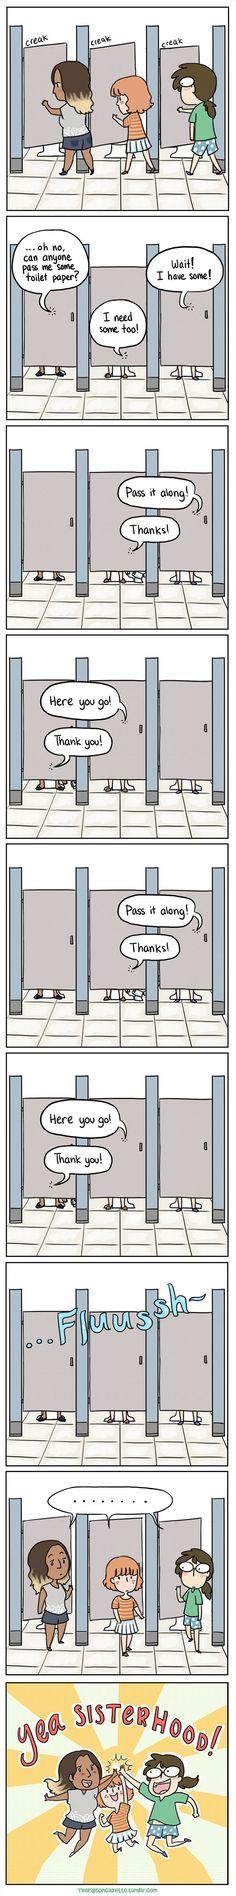 10 Hilarious Comics For Socially Awkward People Stupid Funny, Funny Cute, Hilarious, Funny Kids, Life Comics, Fun Comics, The Pigeon Gazette, Rage Comic, Funny Memes